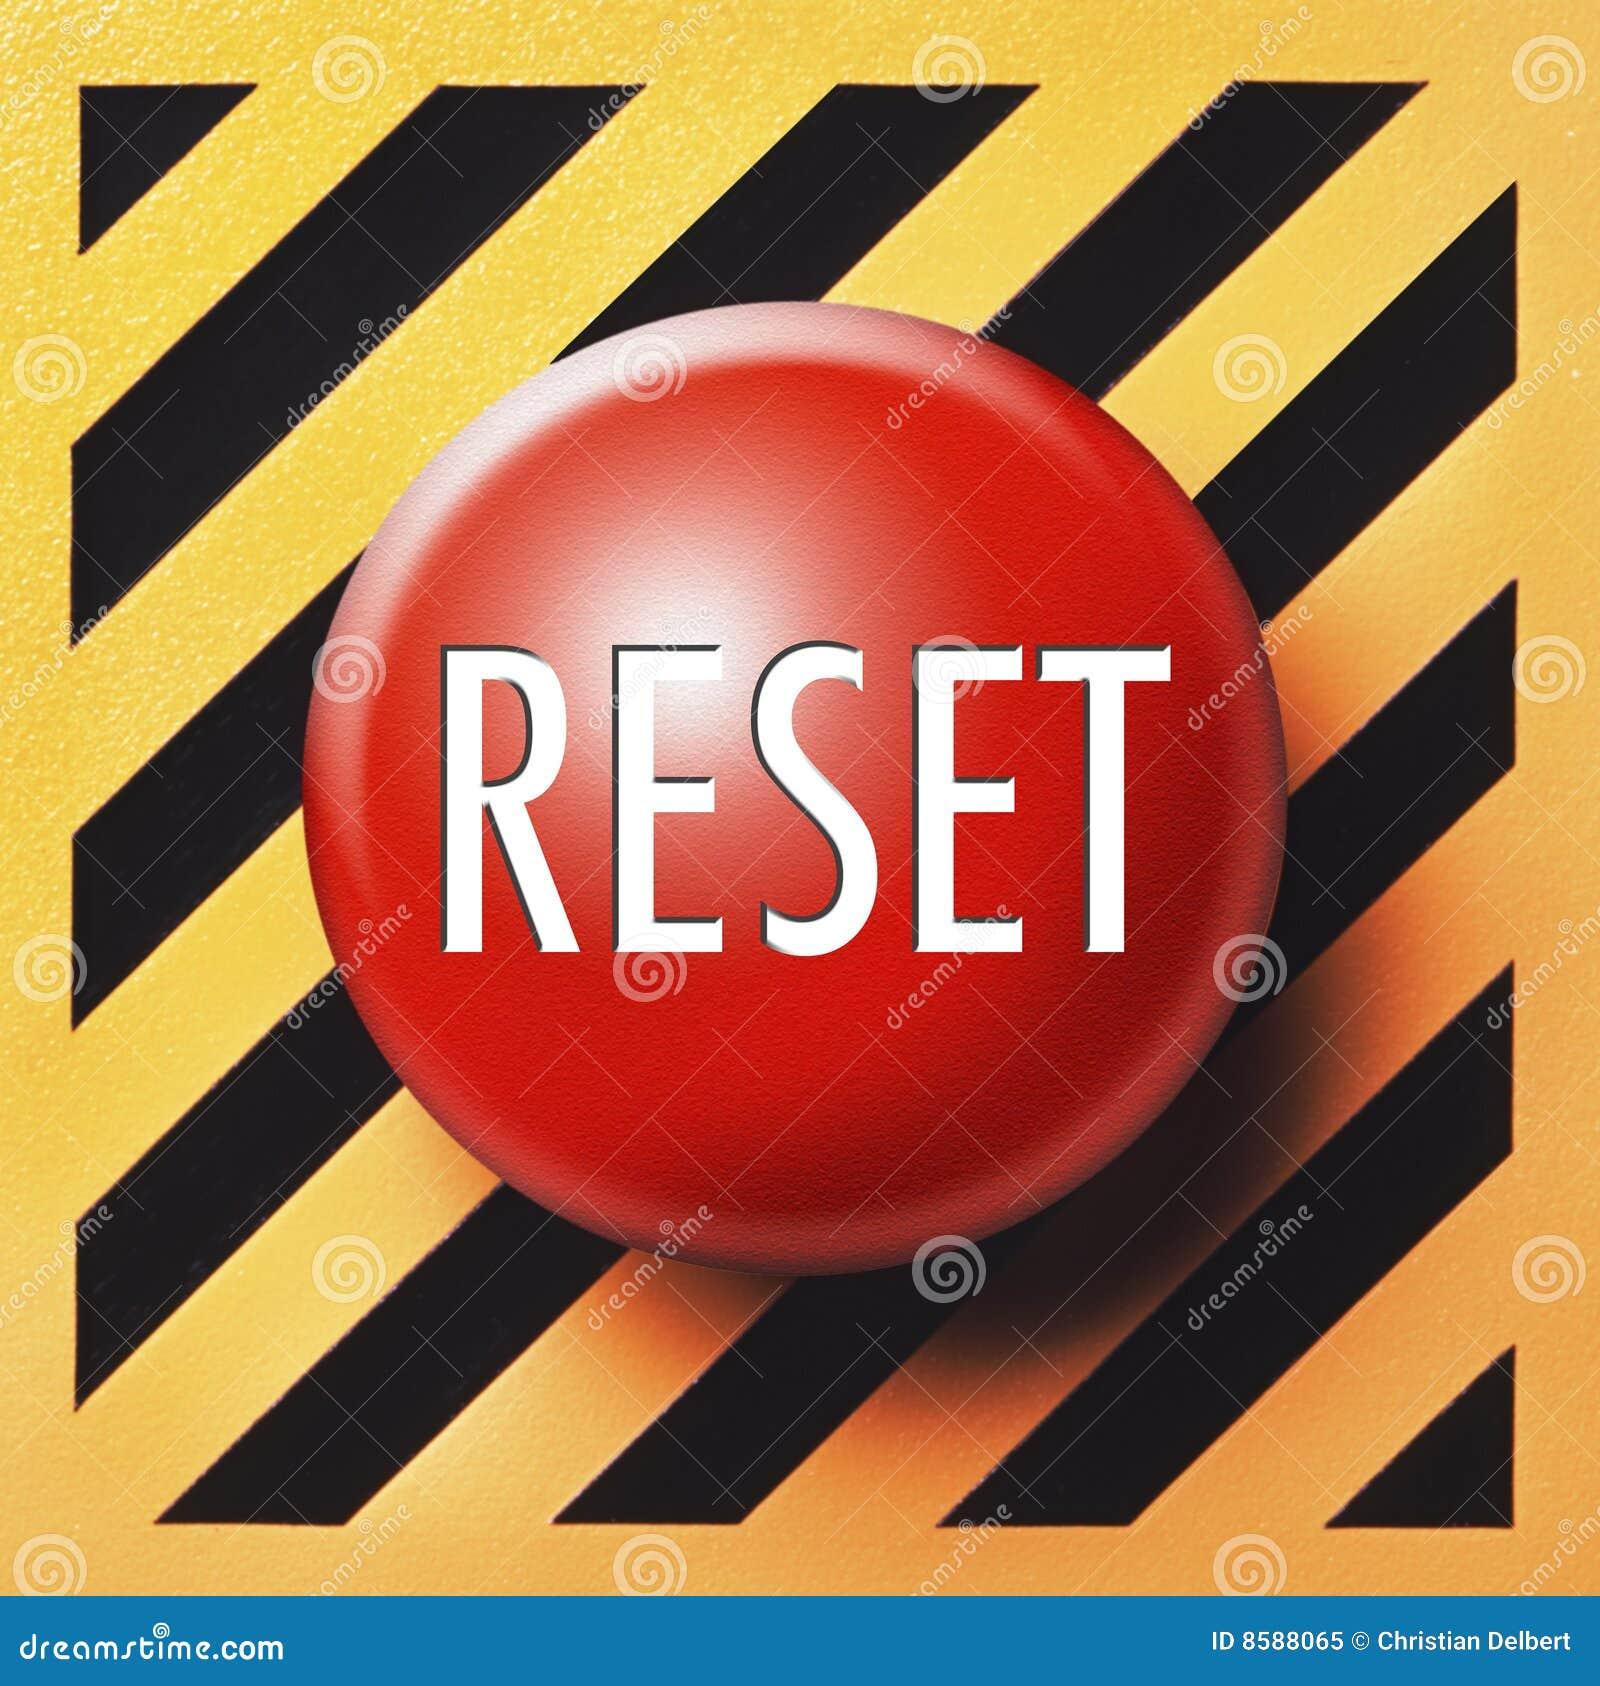 reset button stock image image of orange black button 8588065